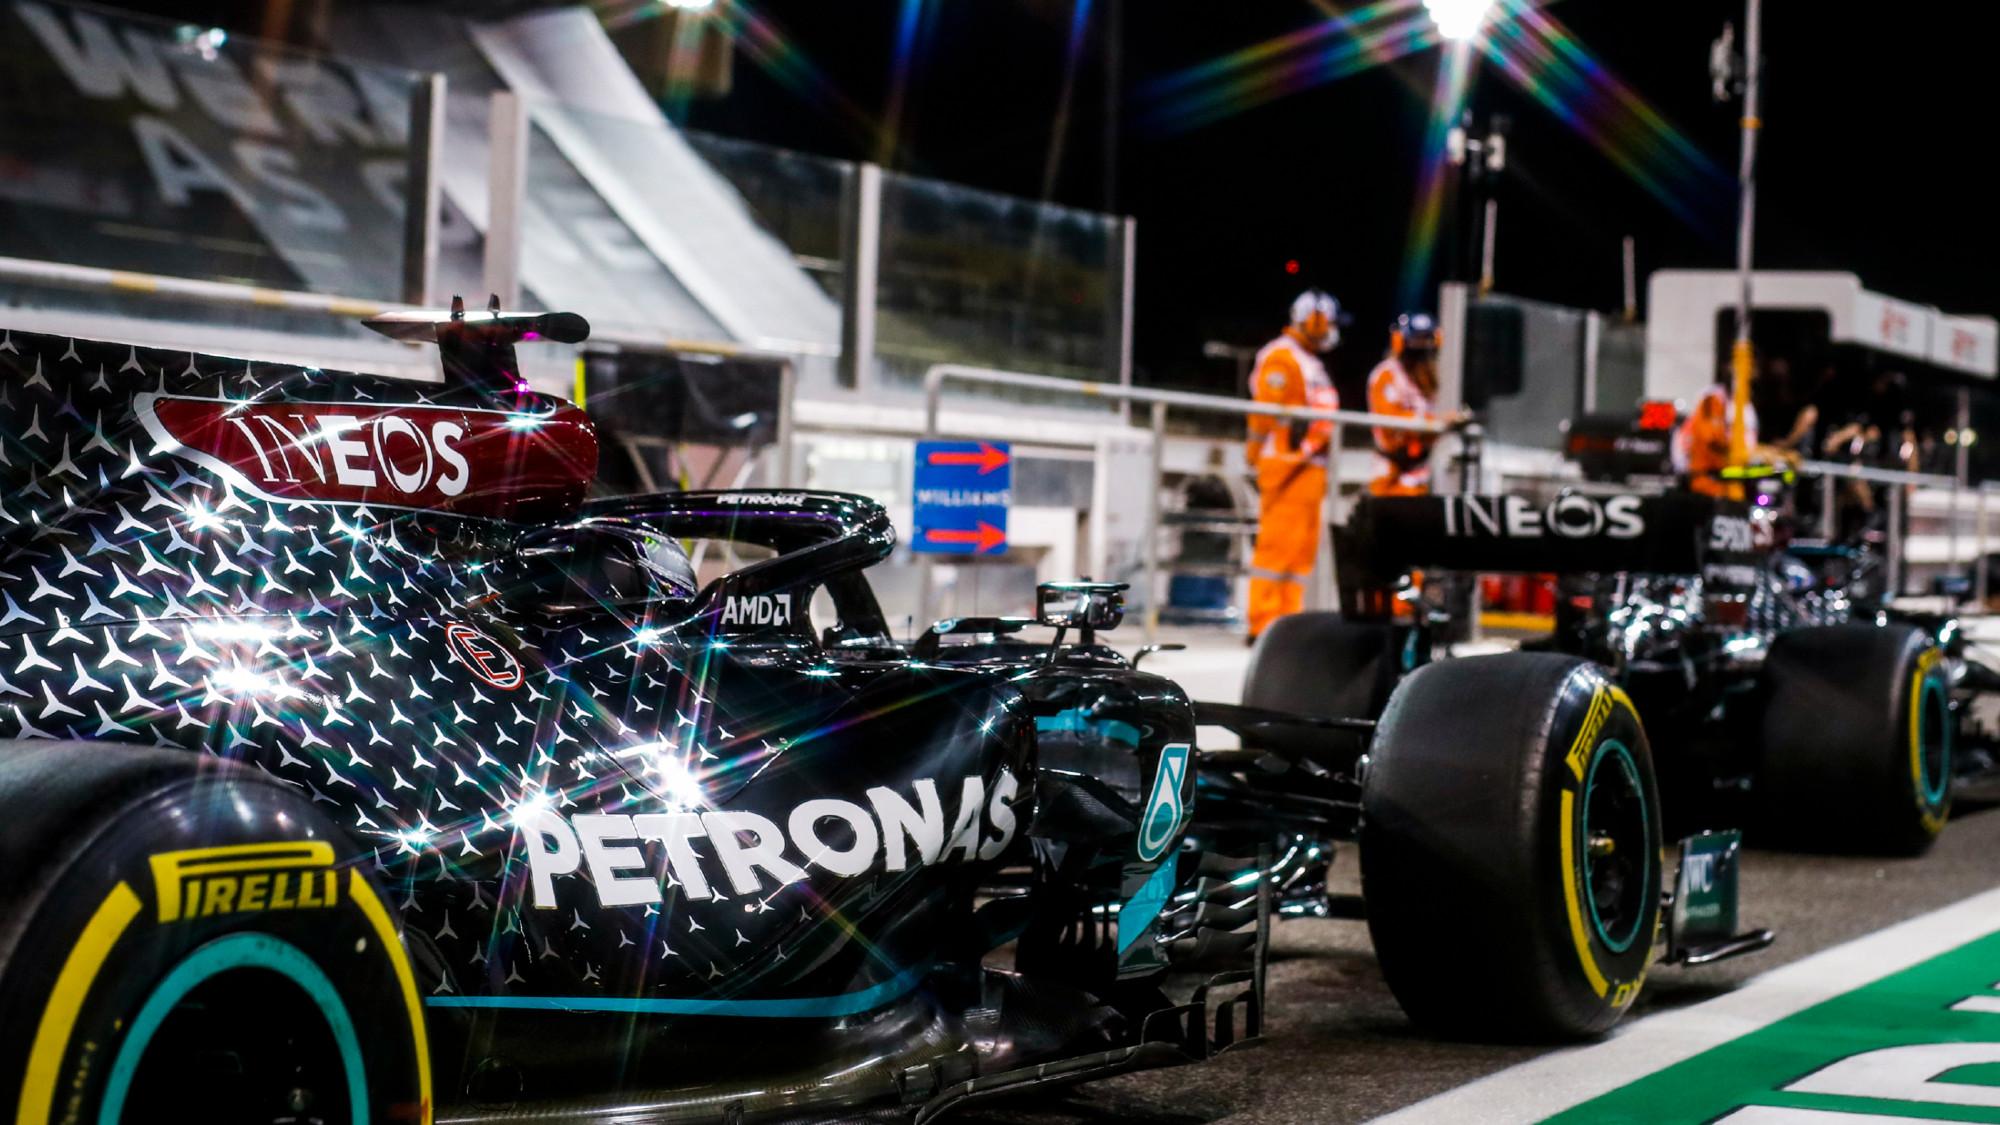 Mercedes W11, Lewis Hamilton Bahrain GP